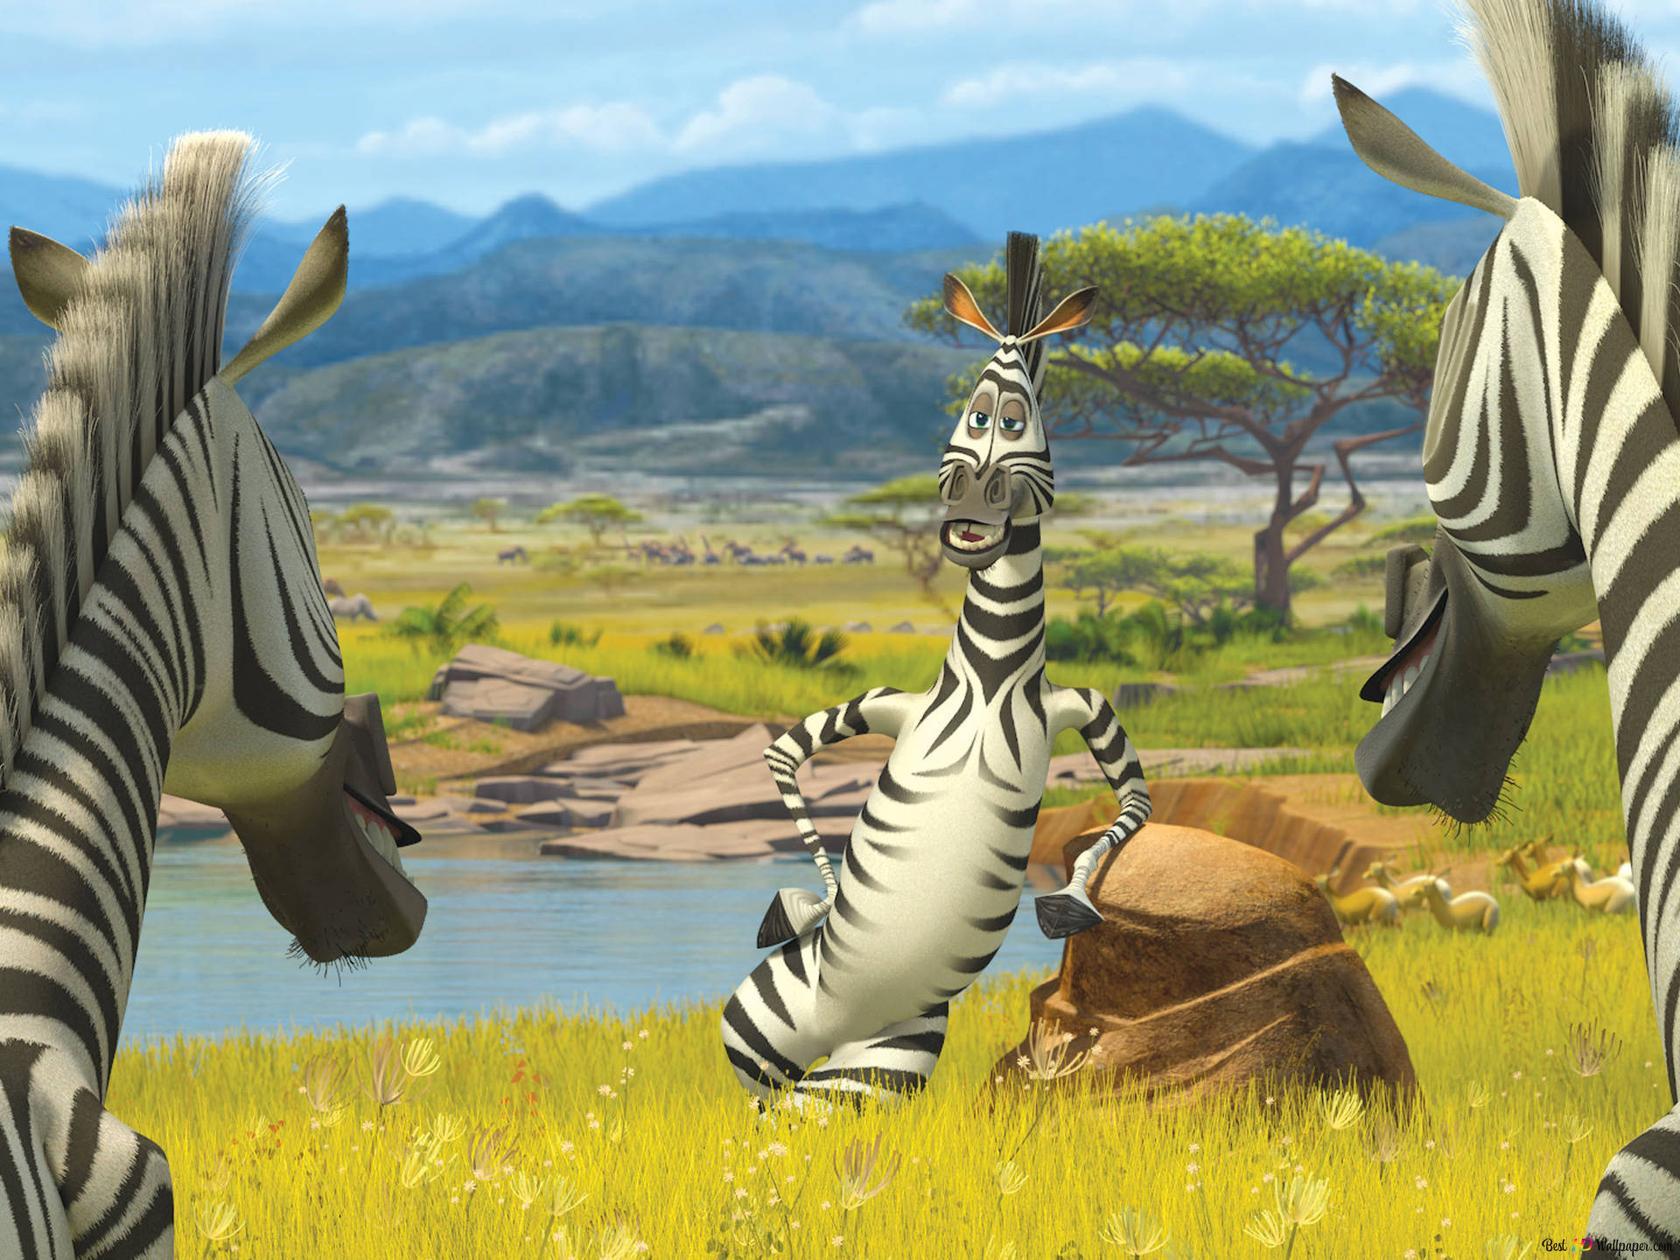 Madagascar movie HD wallpaper download